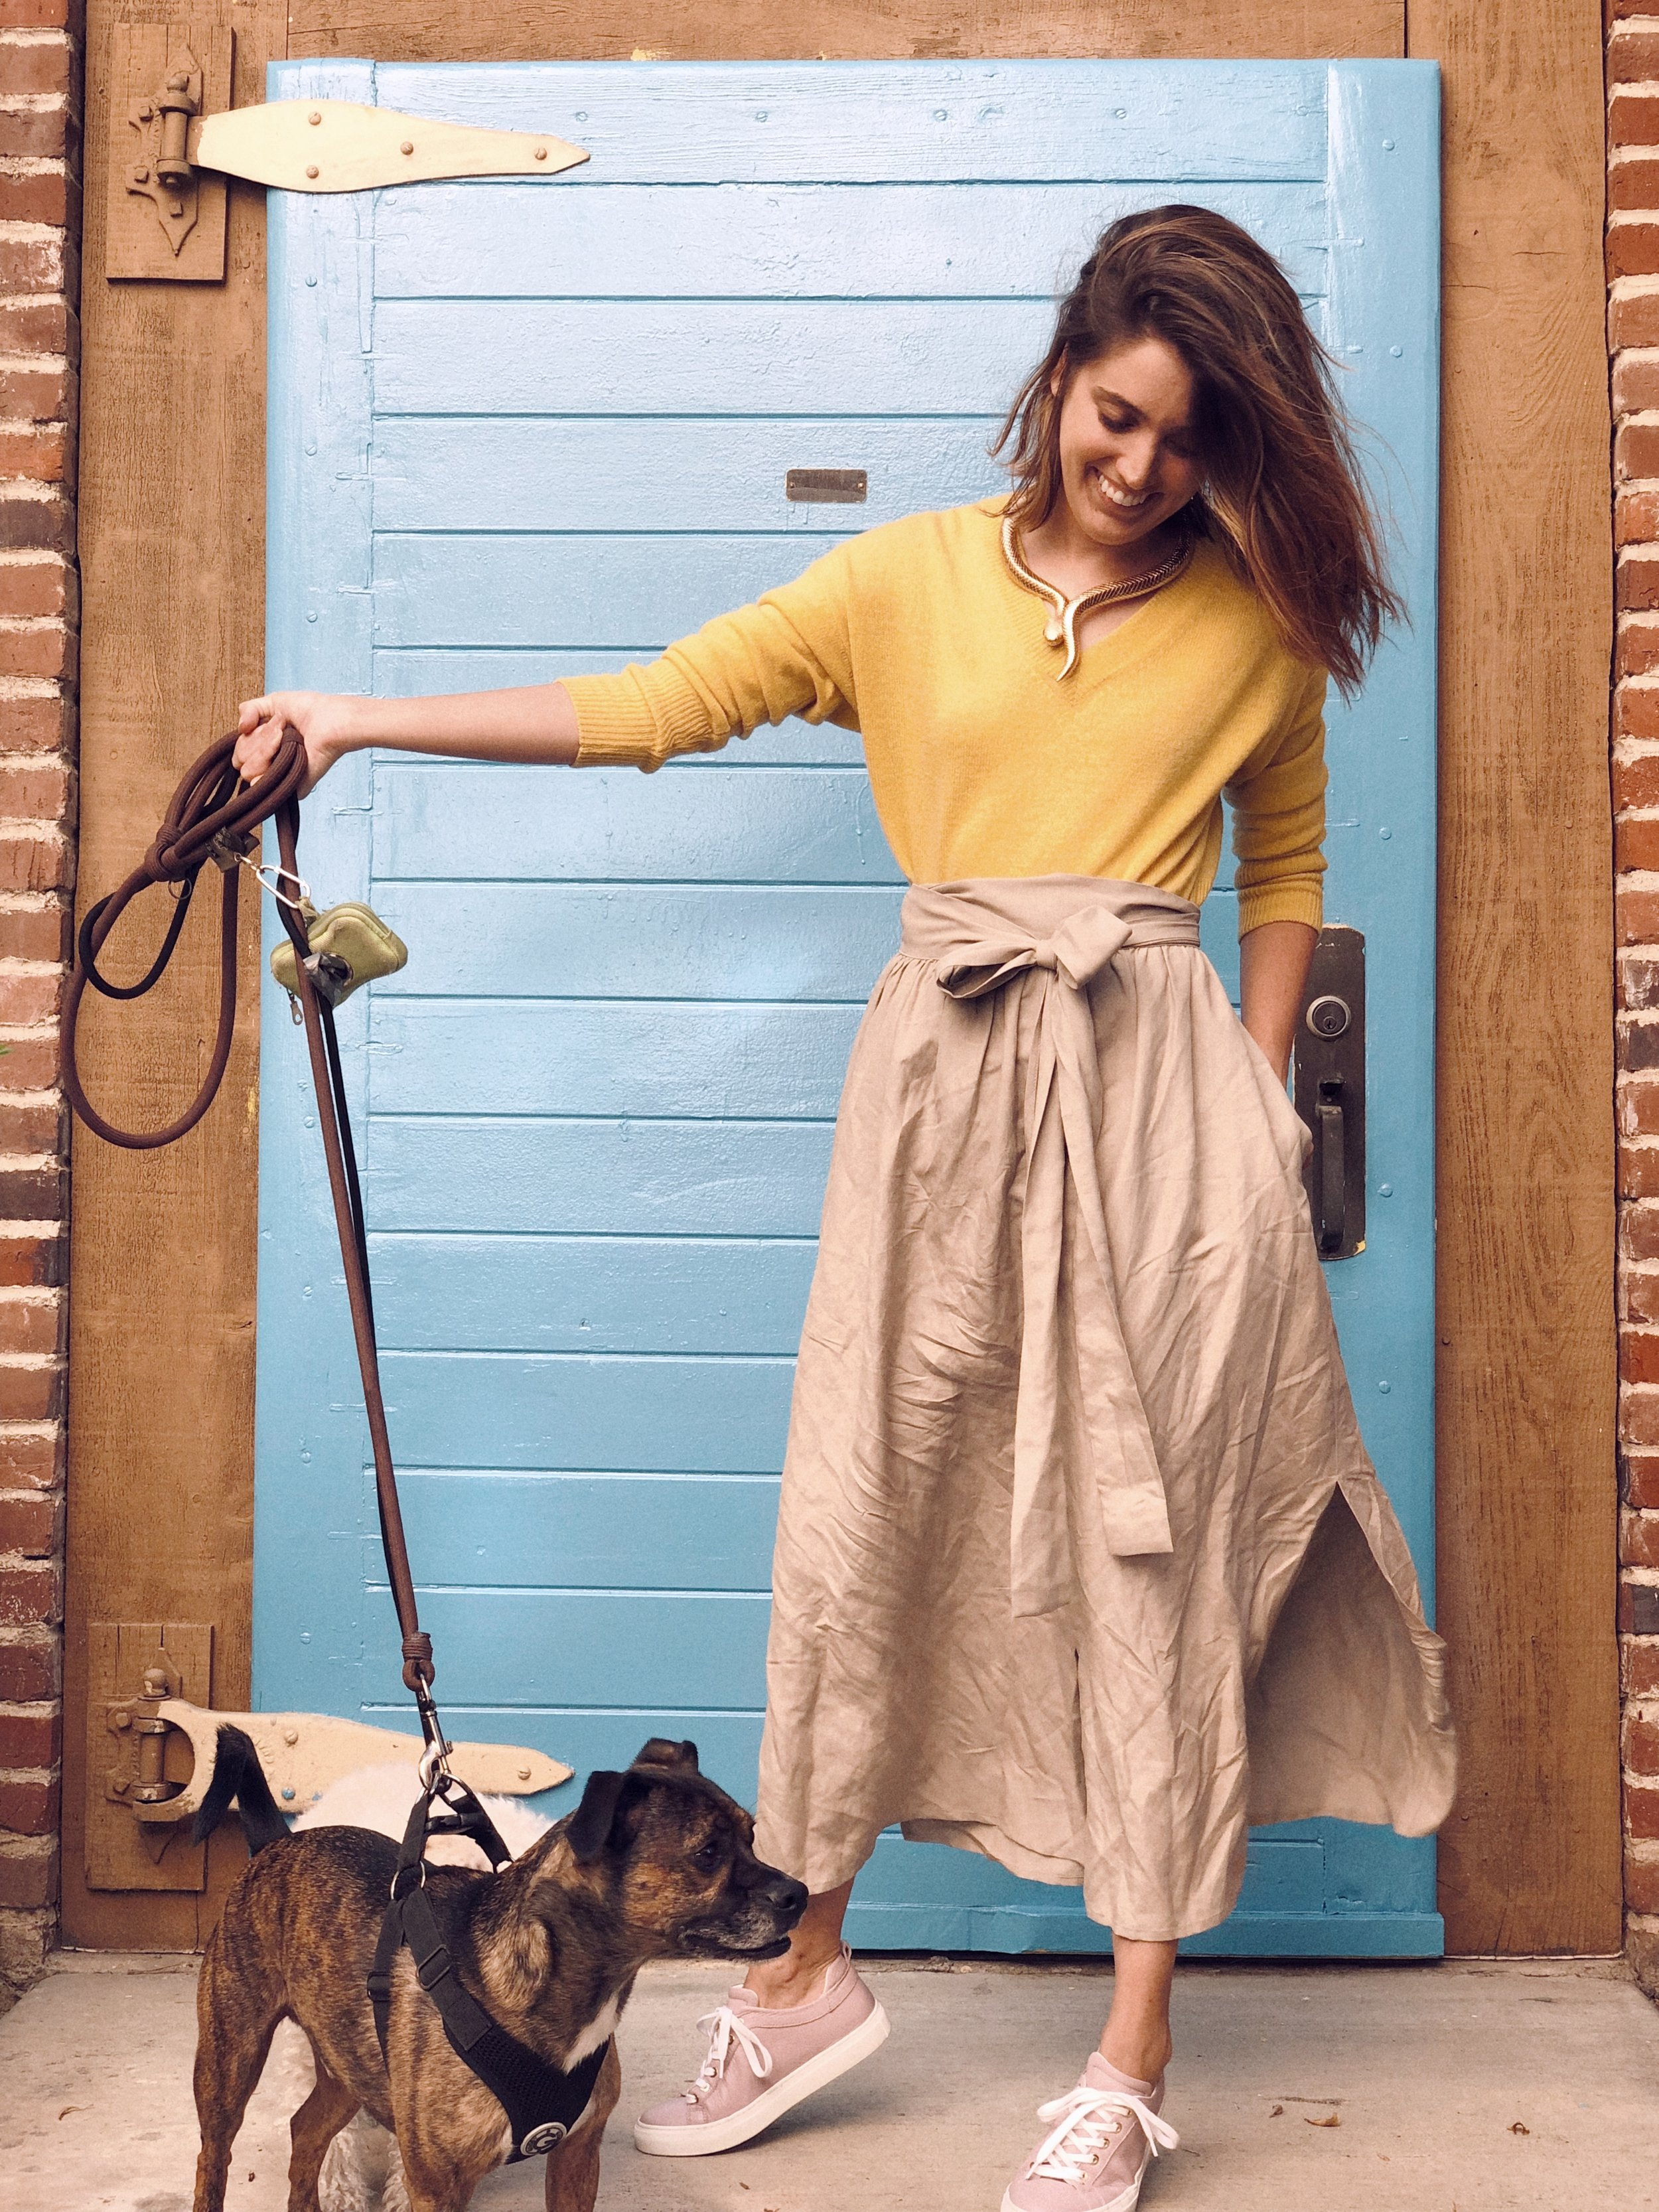 Sweater- Cuyana; Skirt- Ozma of California; Sneakers- M. Gemi; Dog appearance by Yogi